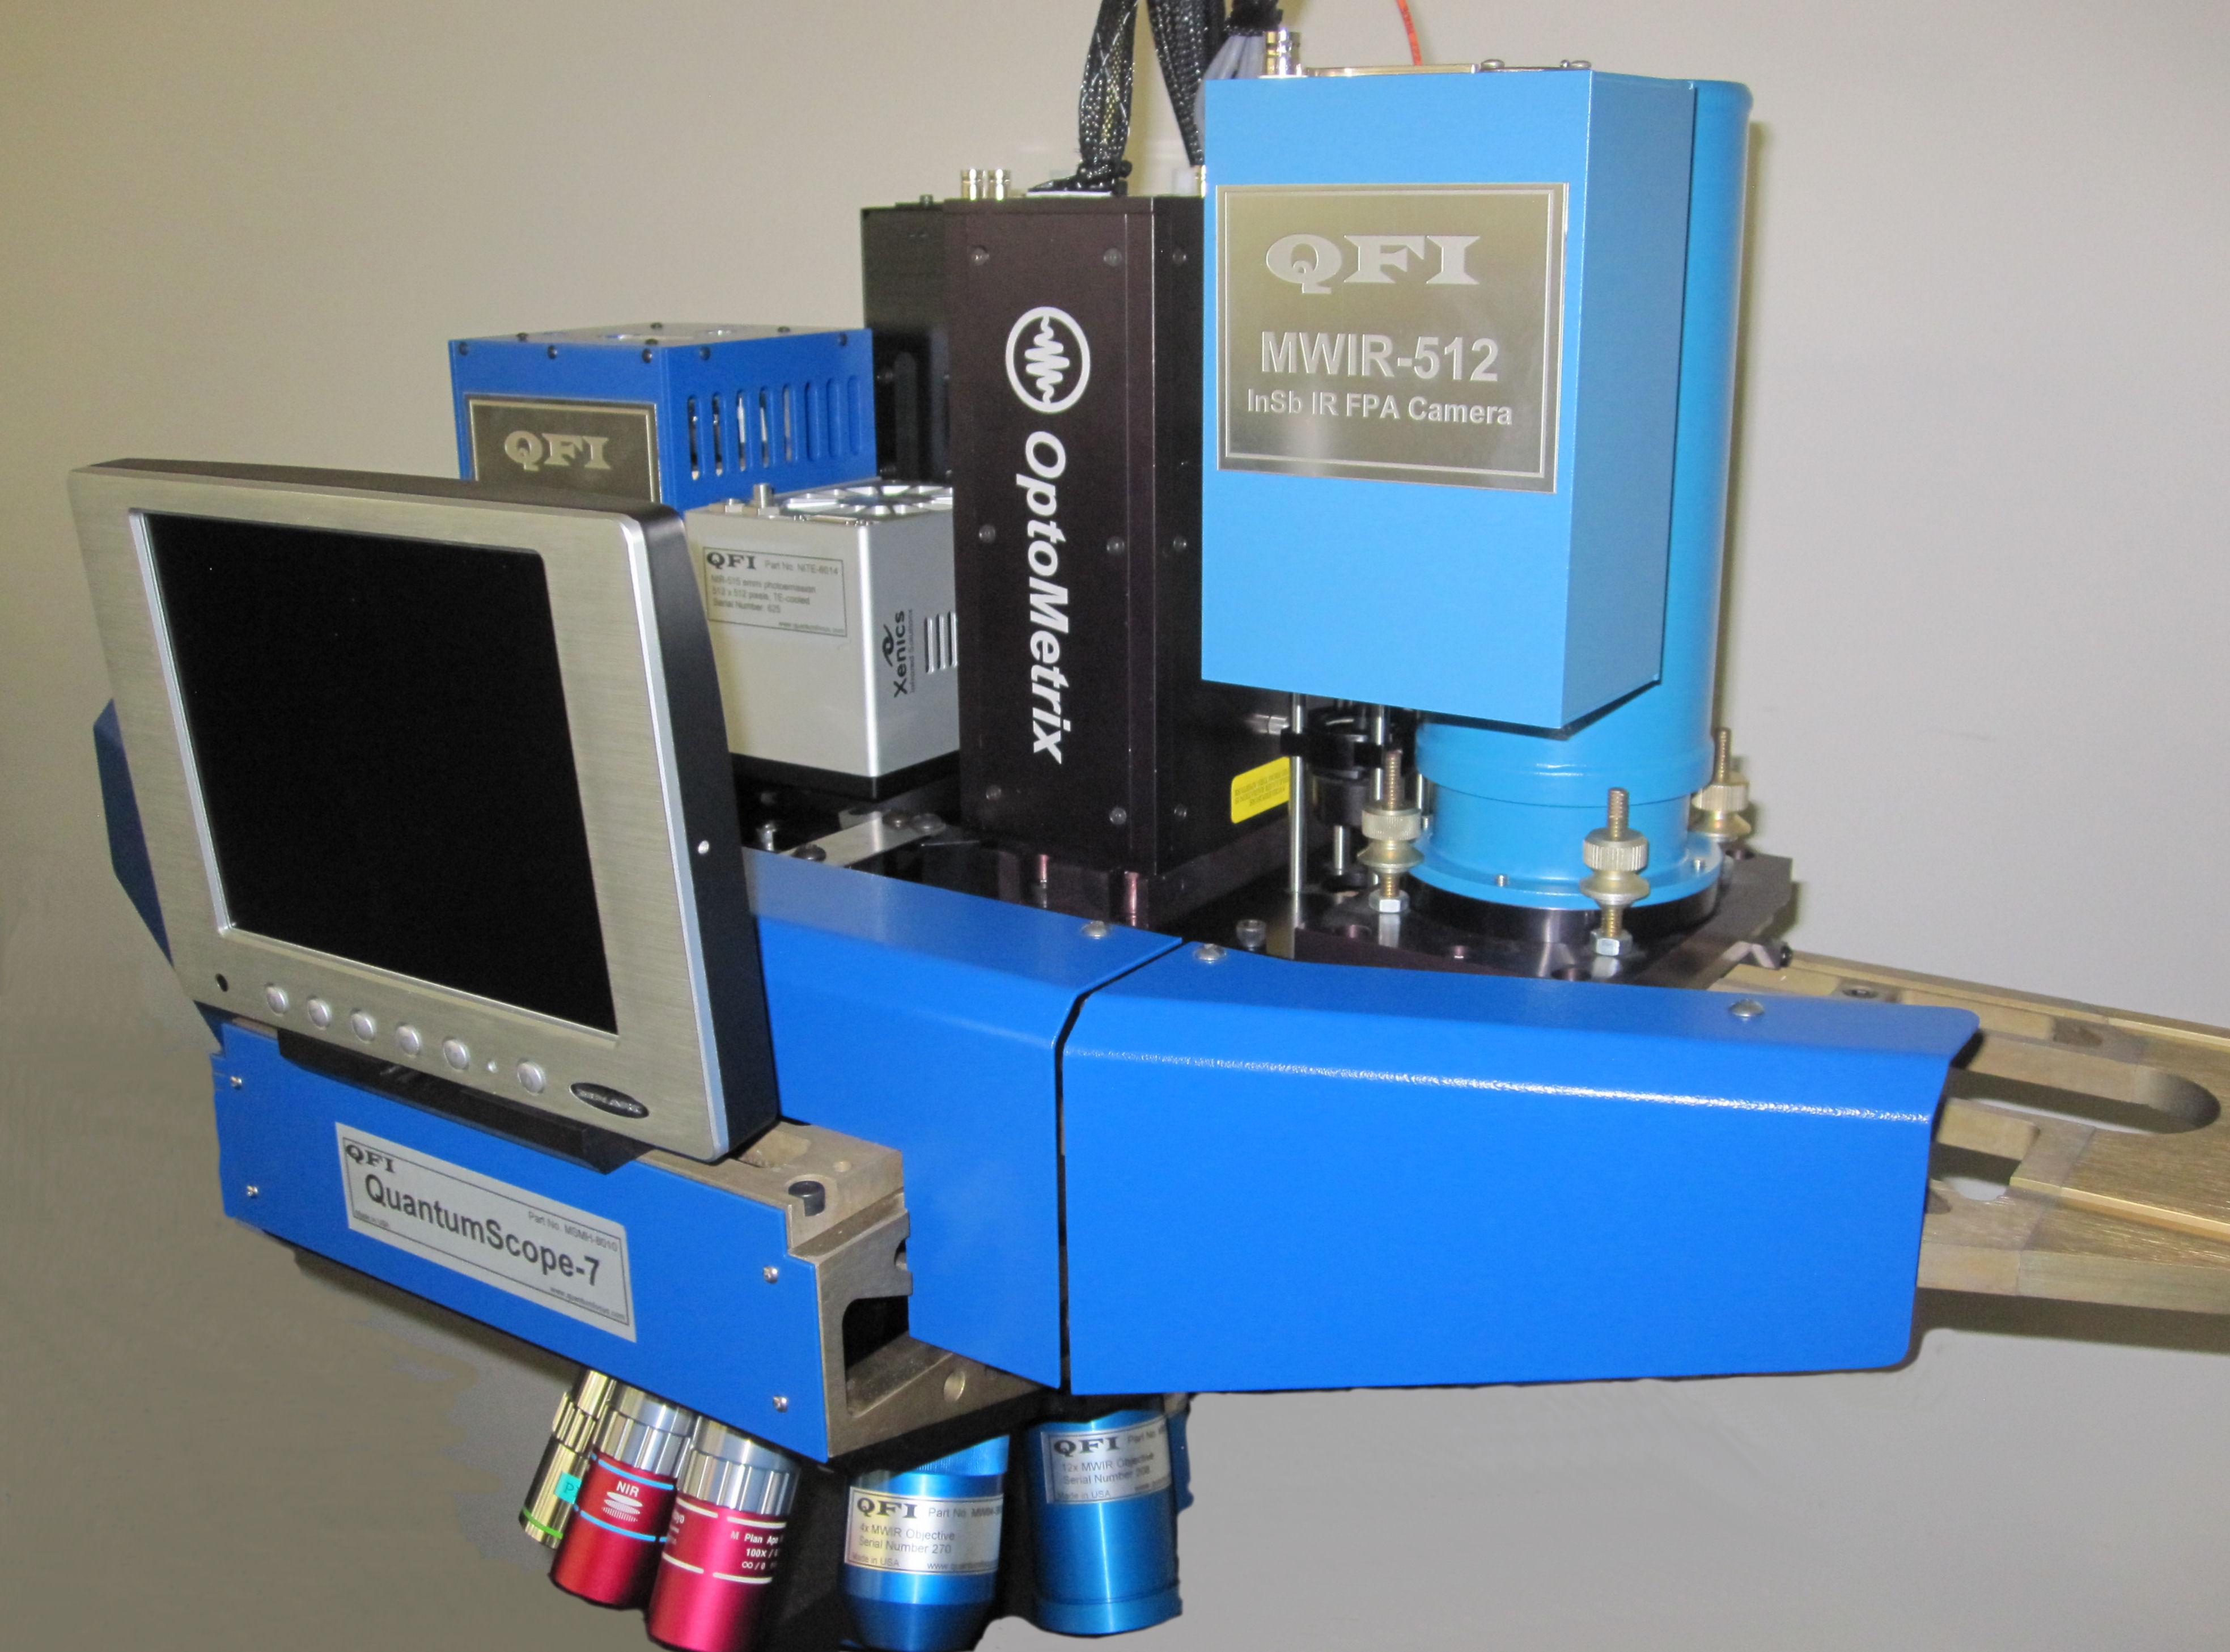 Unique Slide Sensor Stage Embraces Multiple Sensors and Techniques on a Single Microscope Optical Head - Maximizing Defect Capture Rates